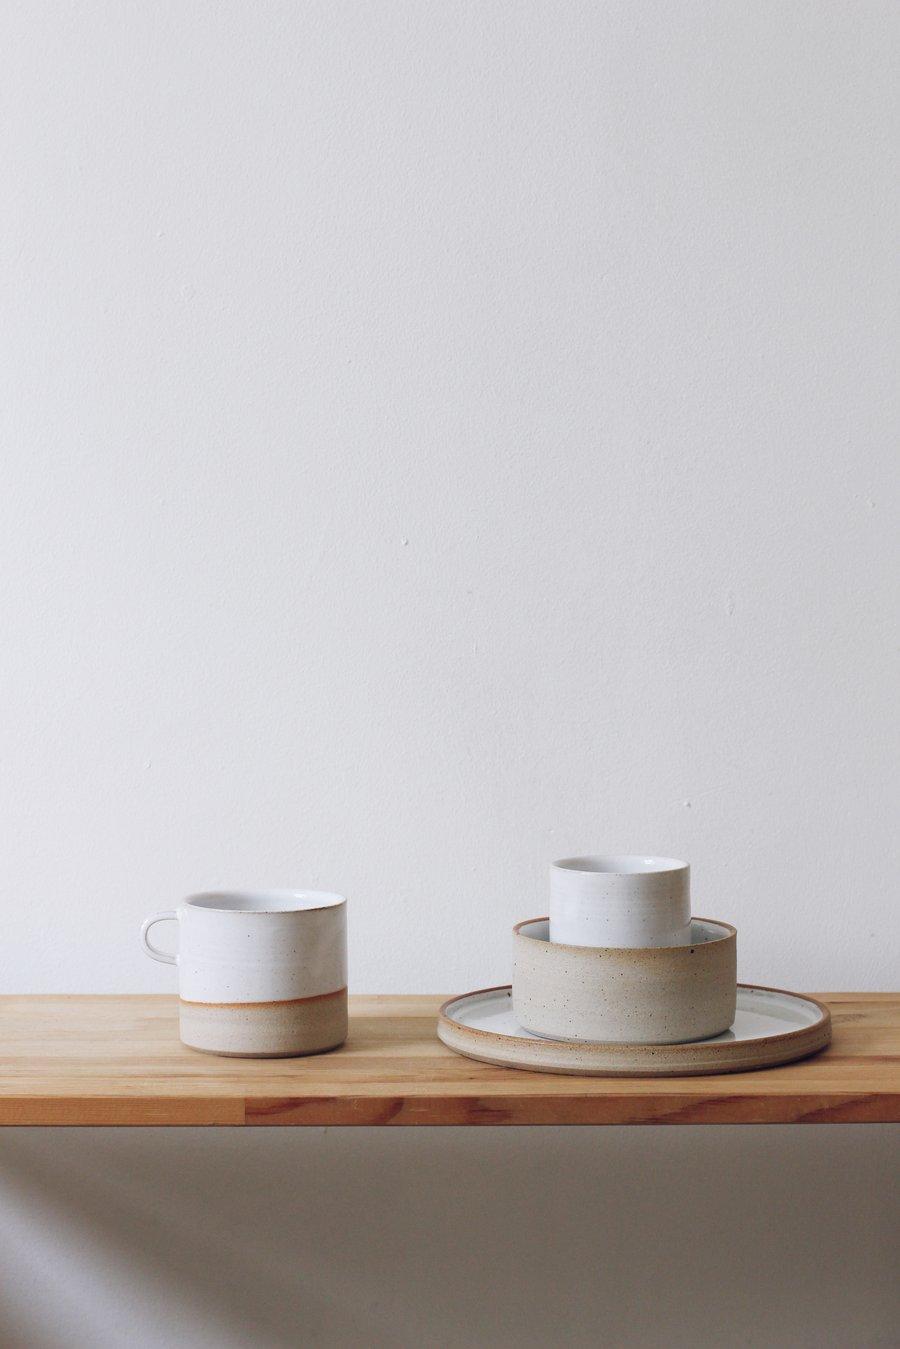 Image of The Breakfast Club - White Glaze